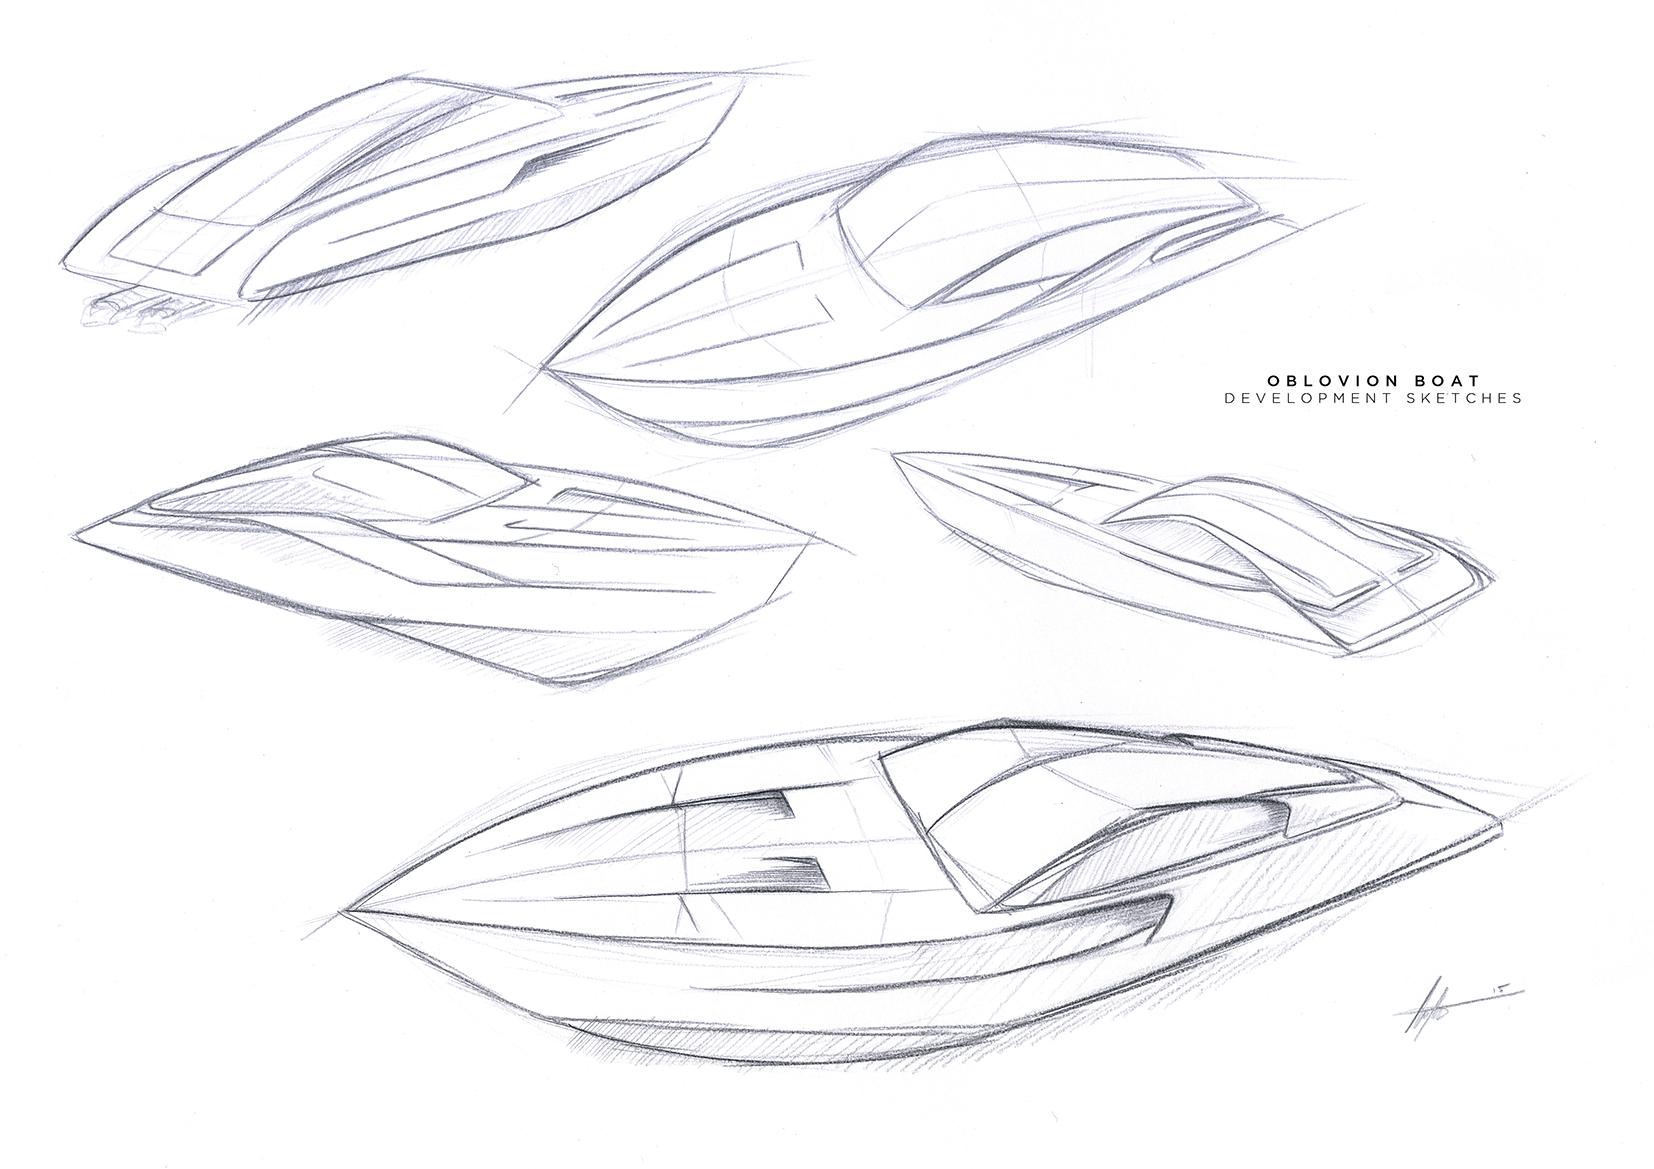 Development_Sketches_Smallfile.jpg